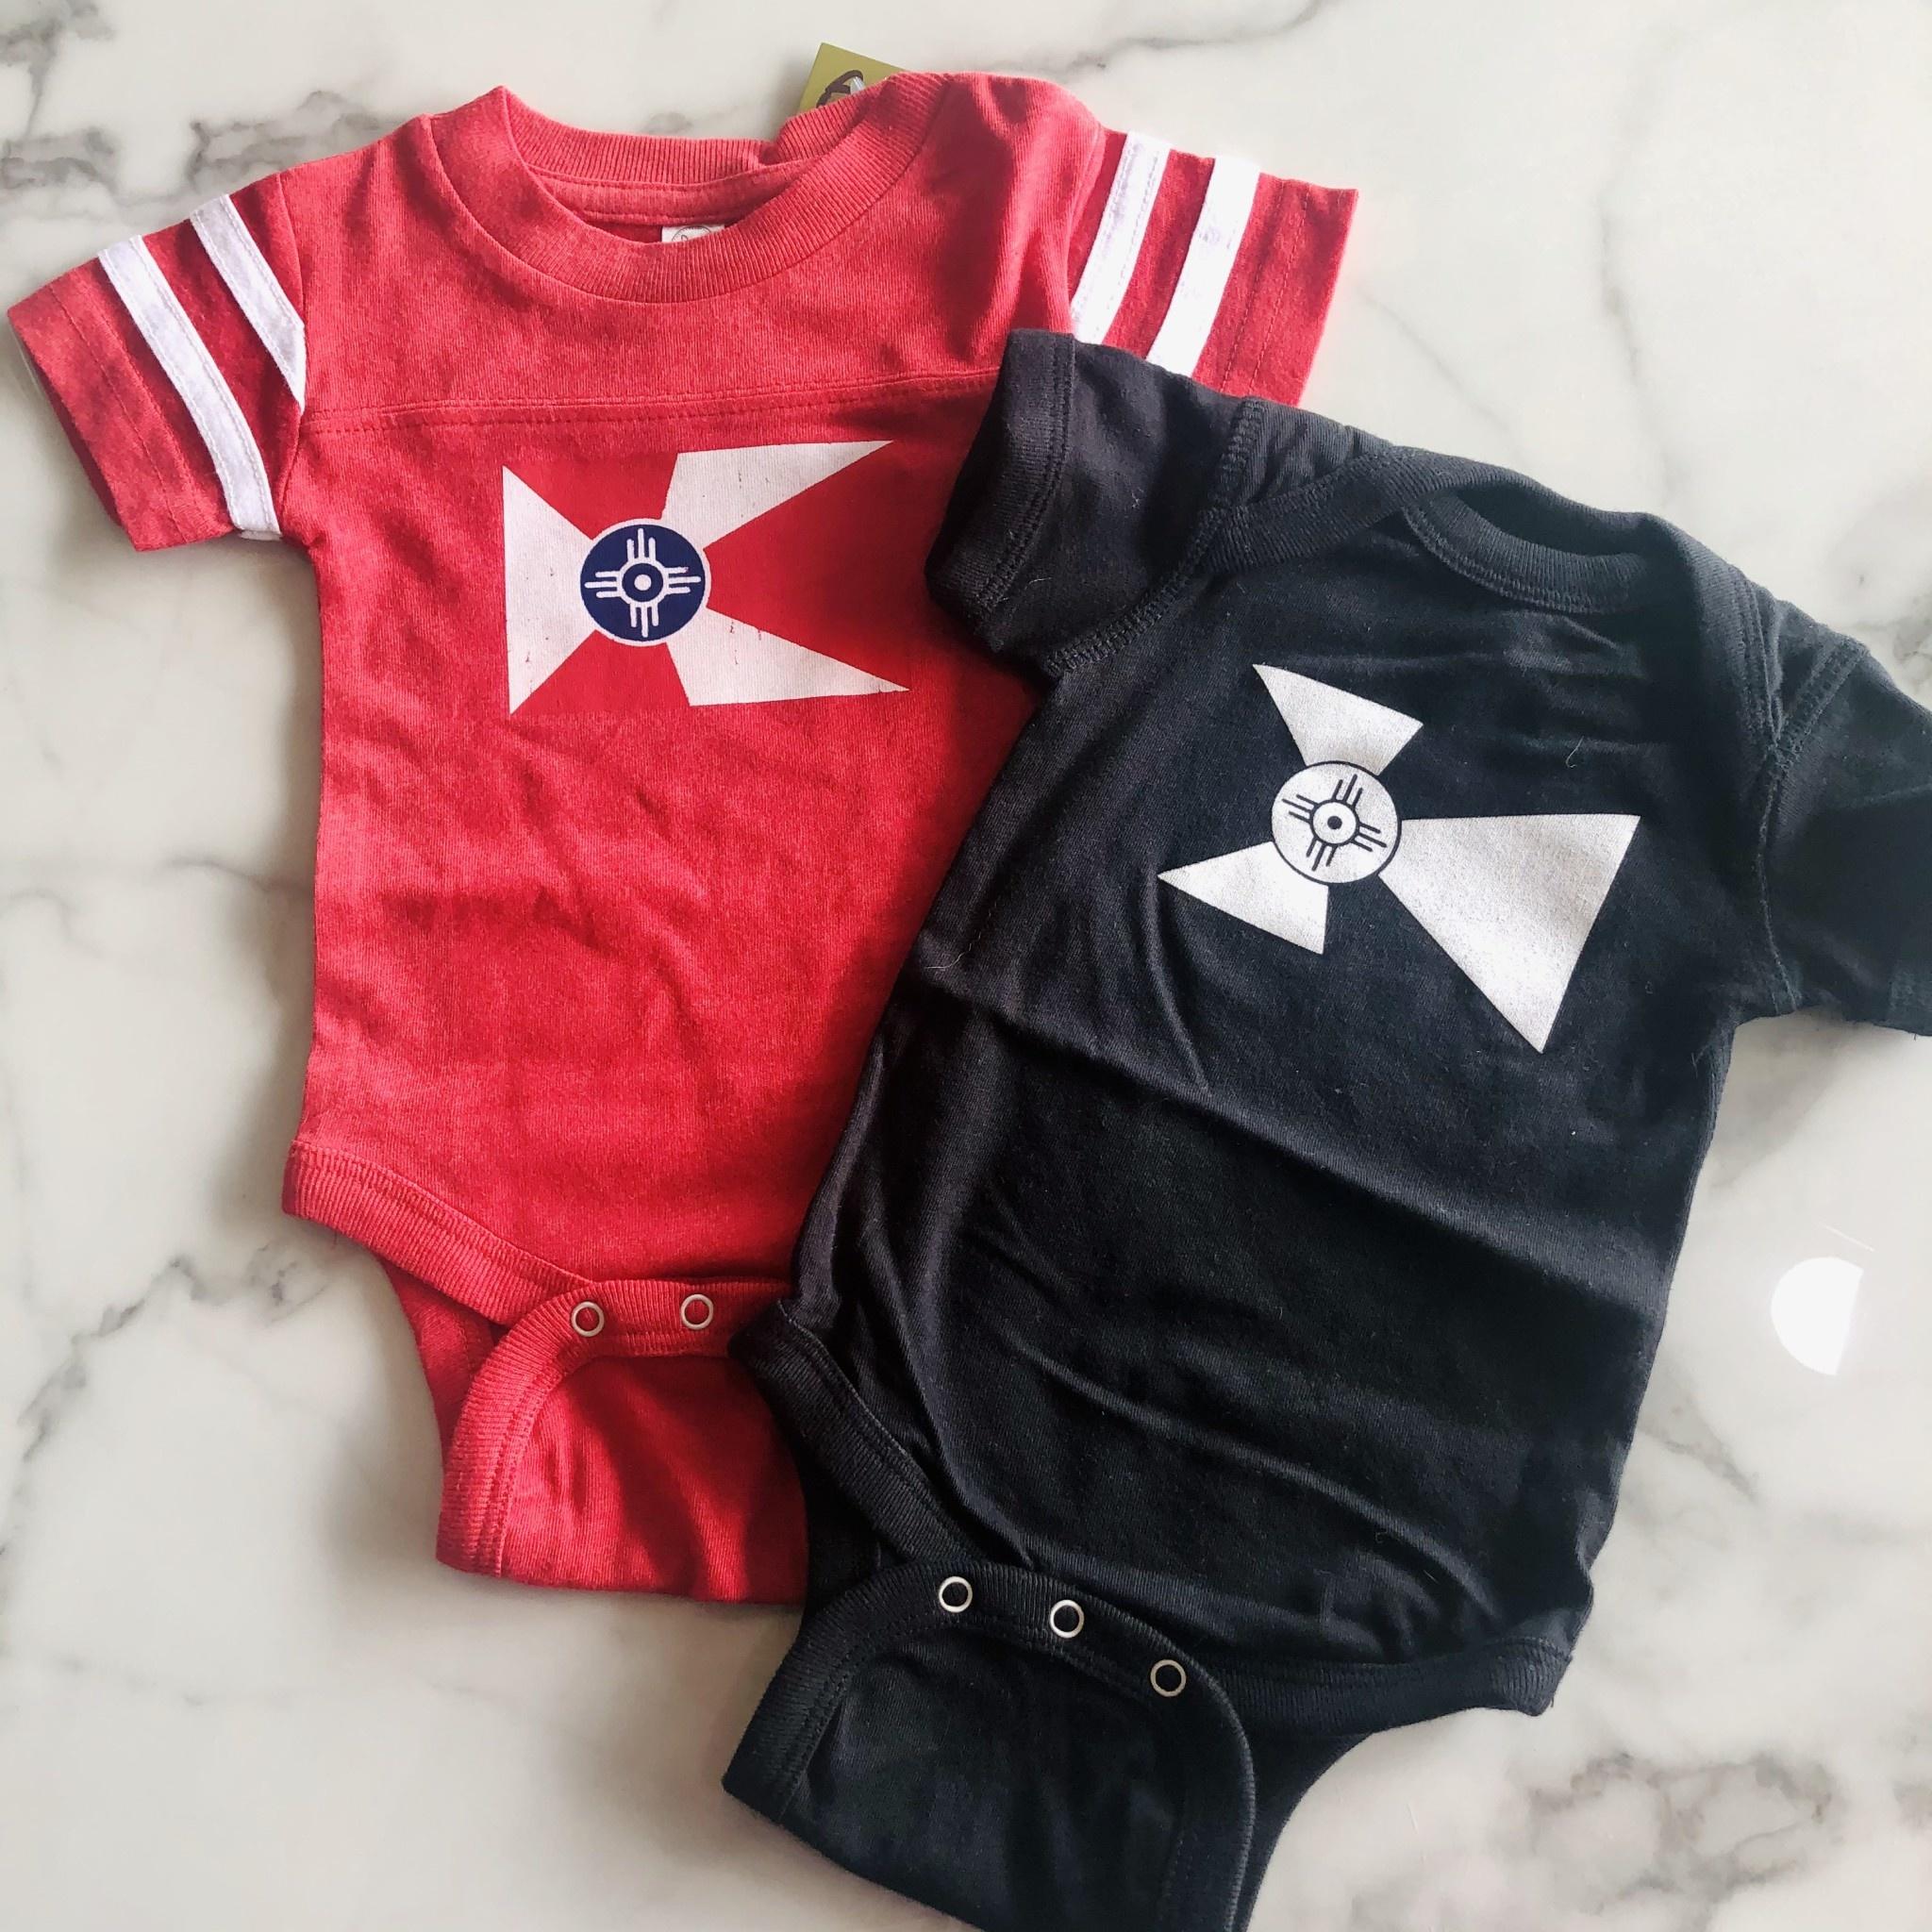 GMFD Wichita Flag Onesie Red/White Stripes